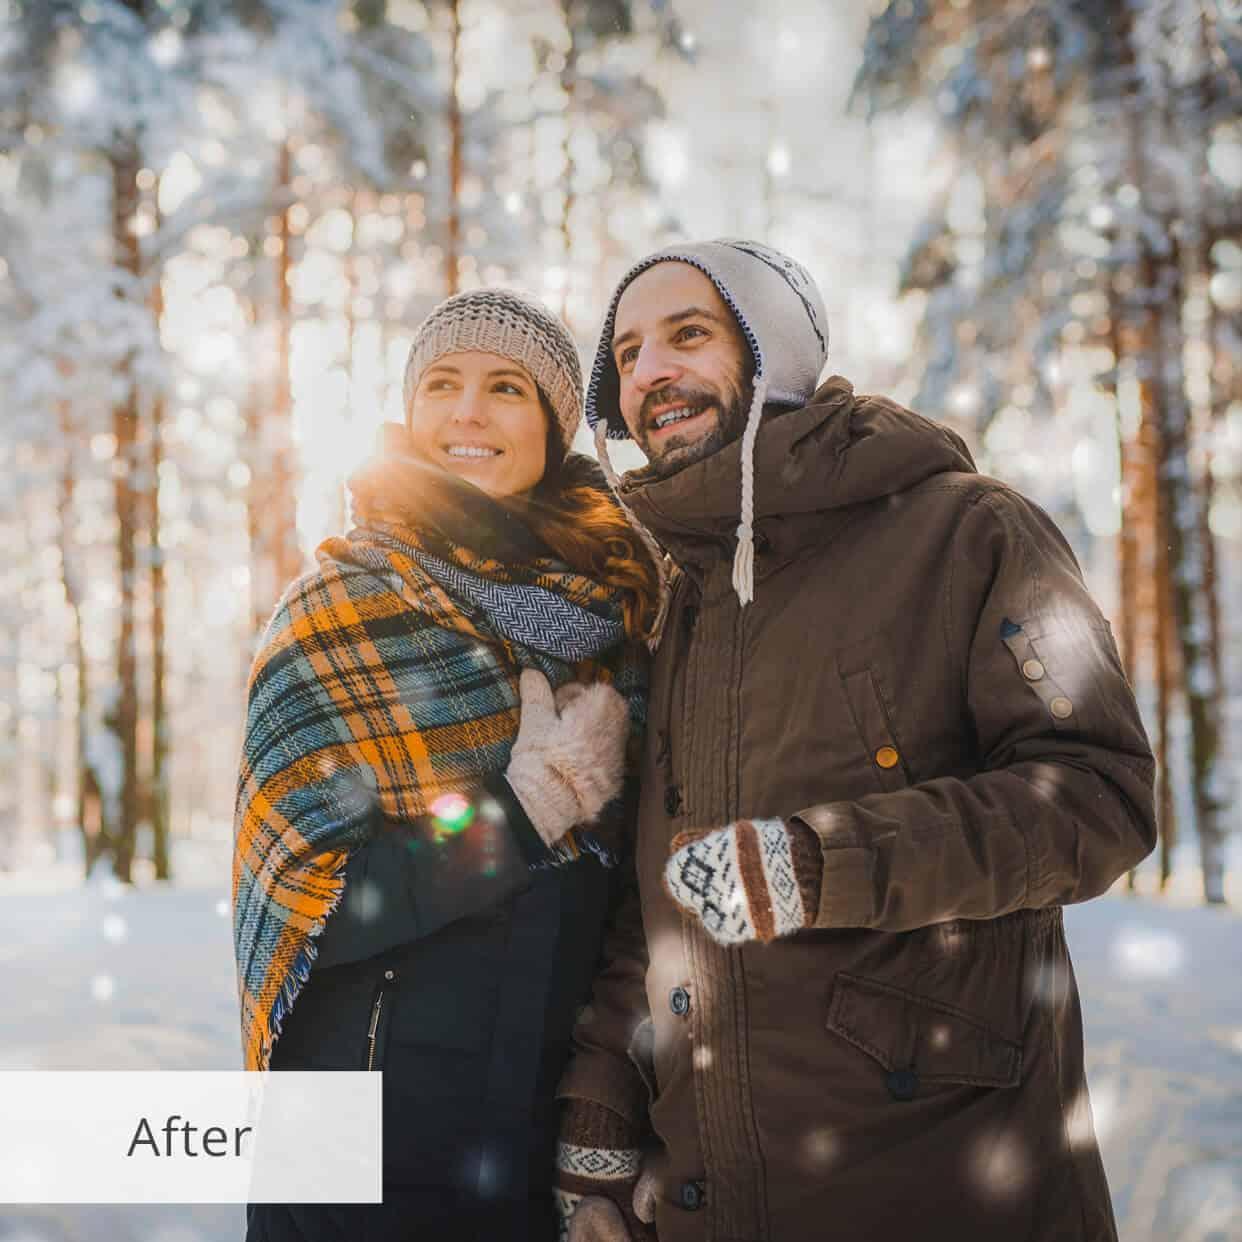 Preset Snow Sunny for lightroom